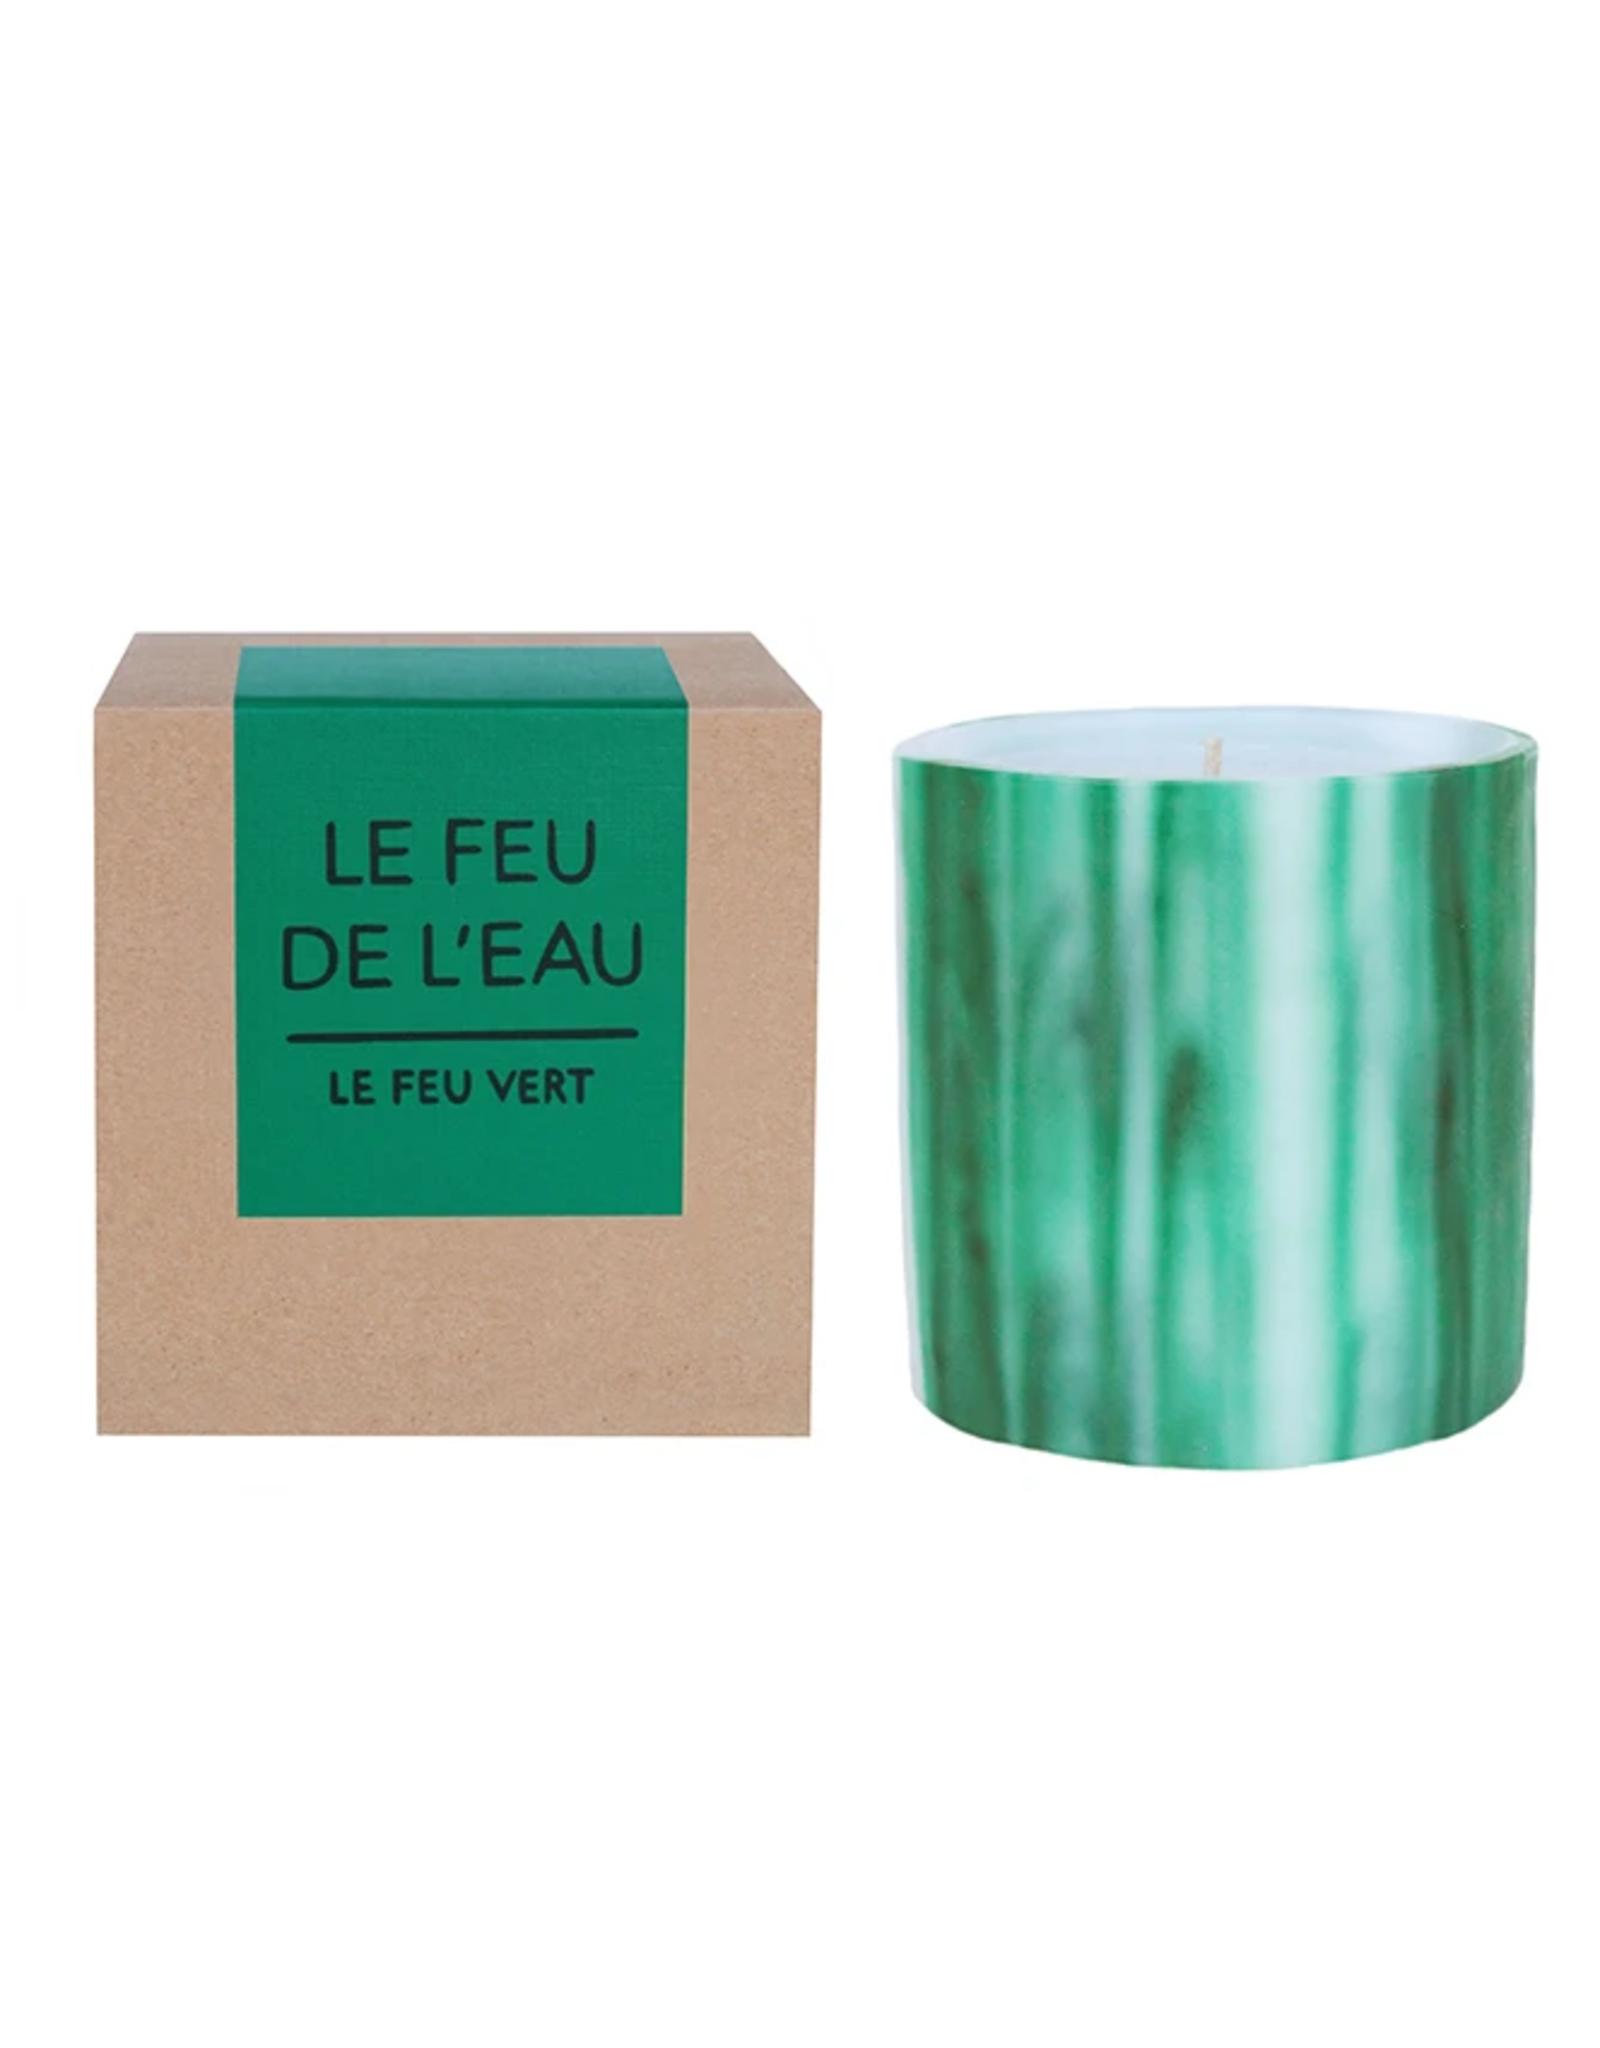 Le Feu De L'Eau Le Feu Vert Candle